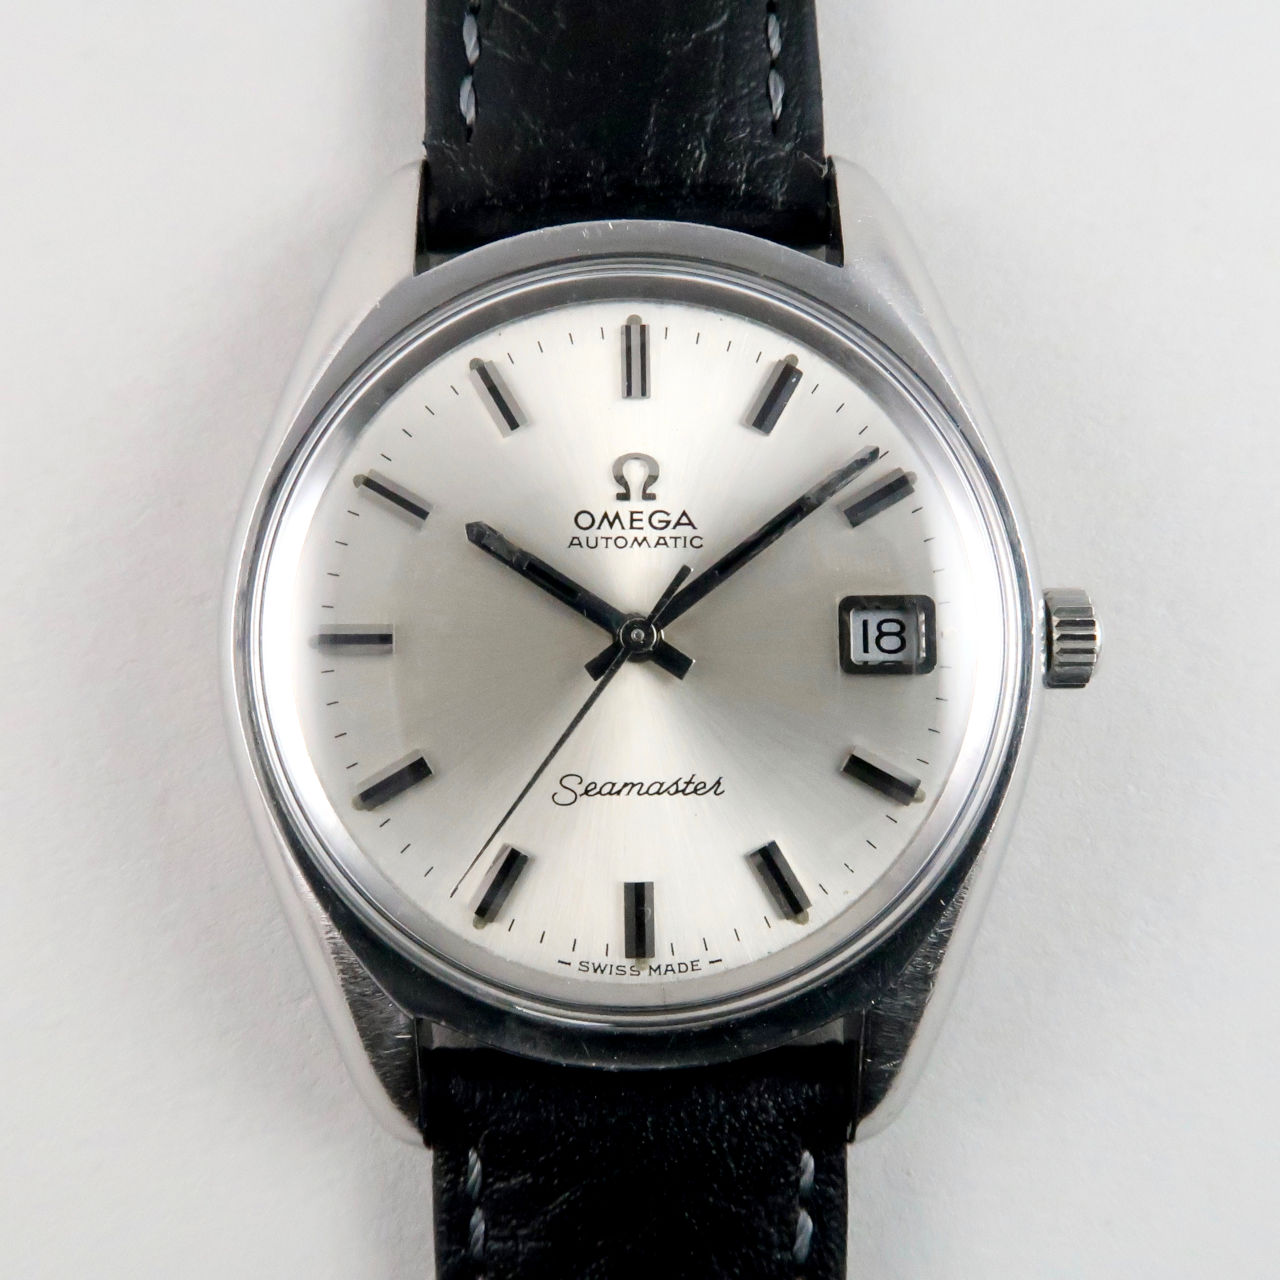 Omega Seamaster Ref. 166.067 circa 1969